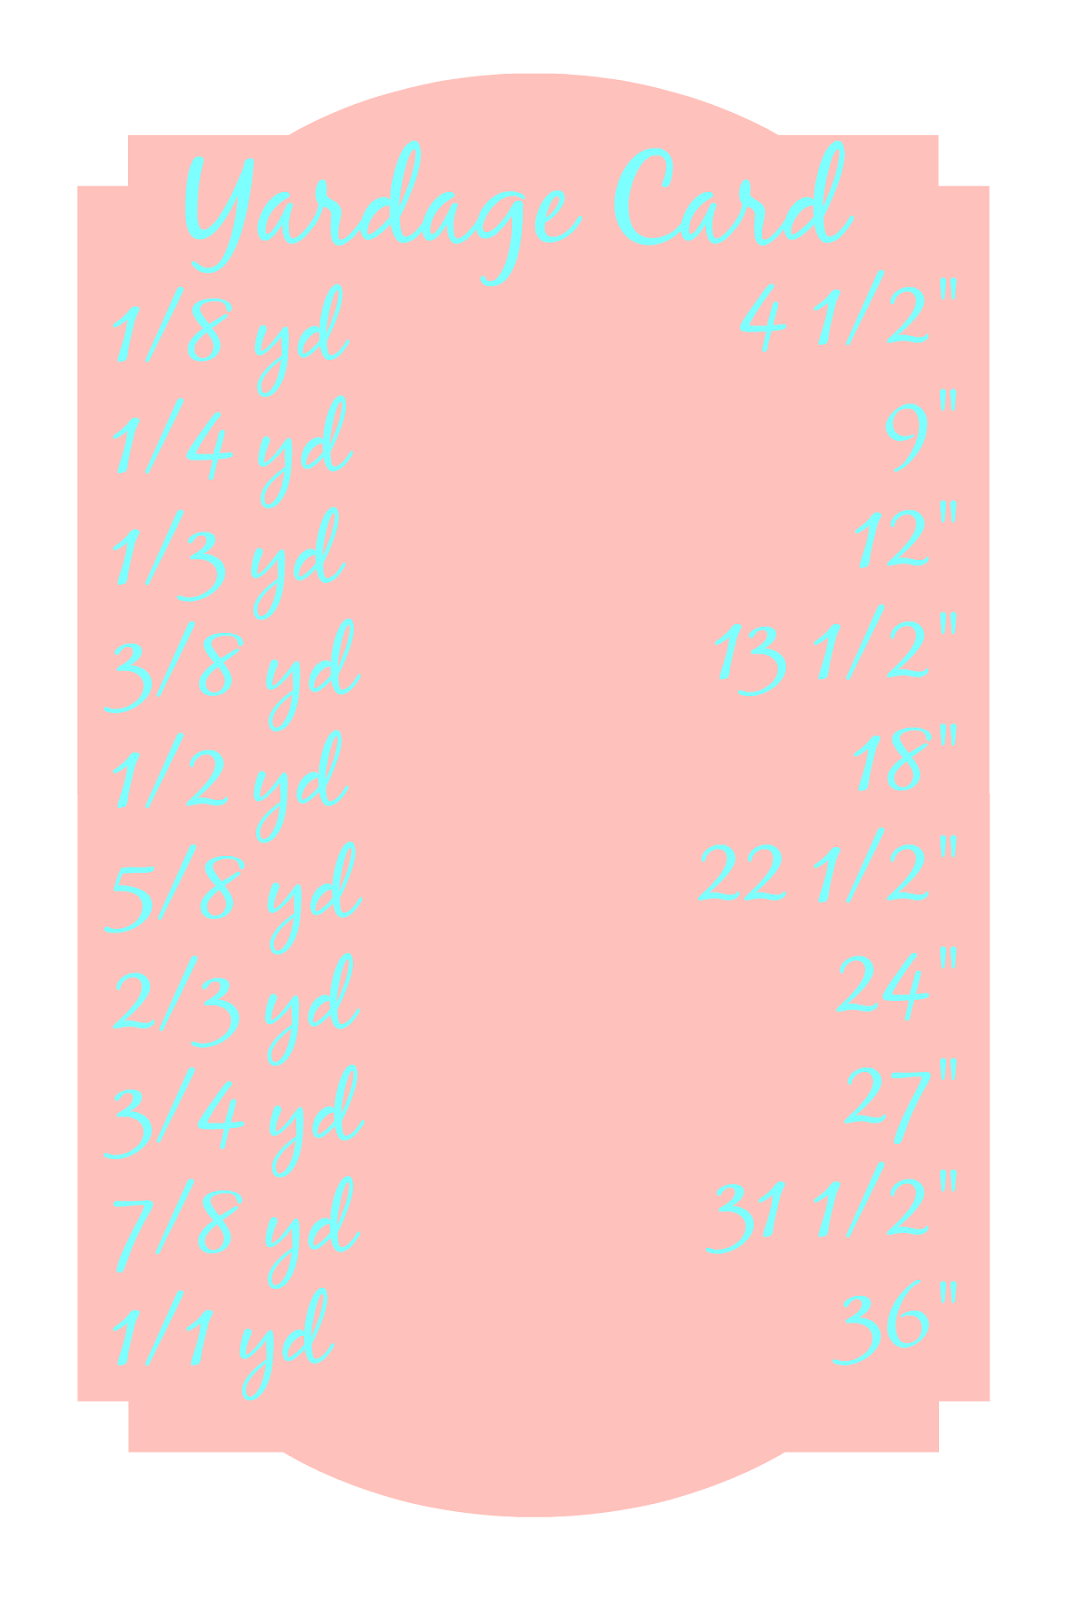 Fabric Yardage Chart